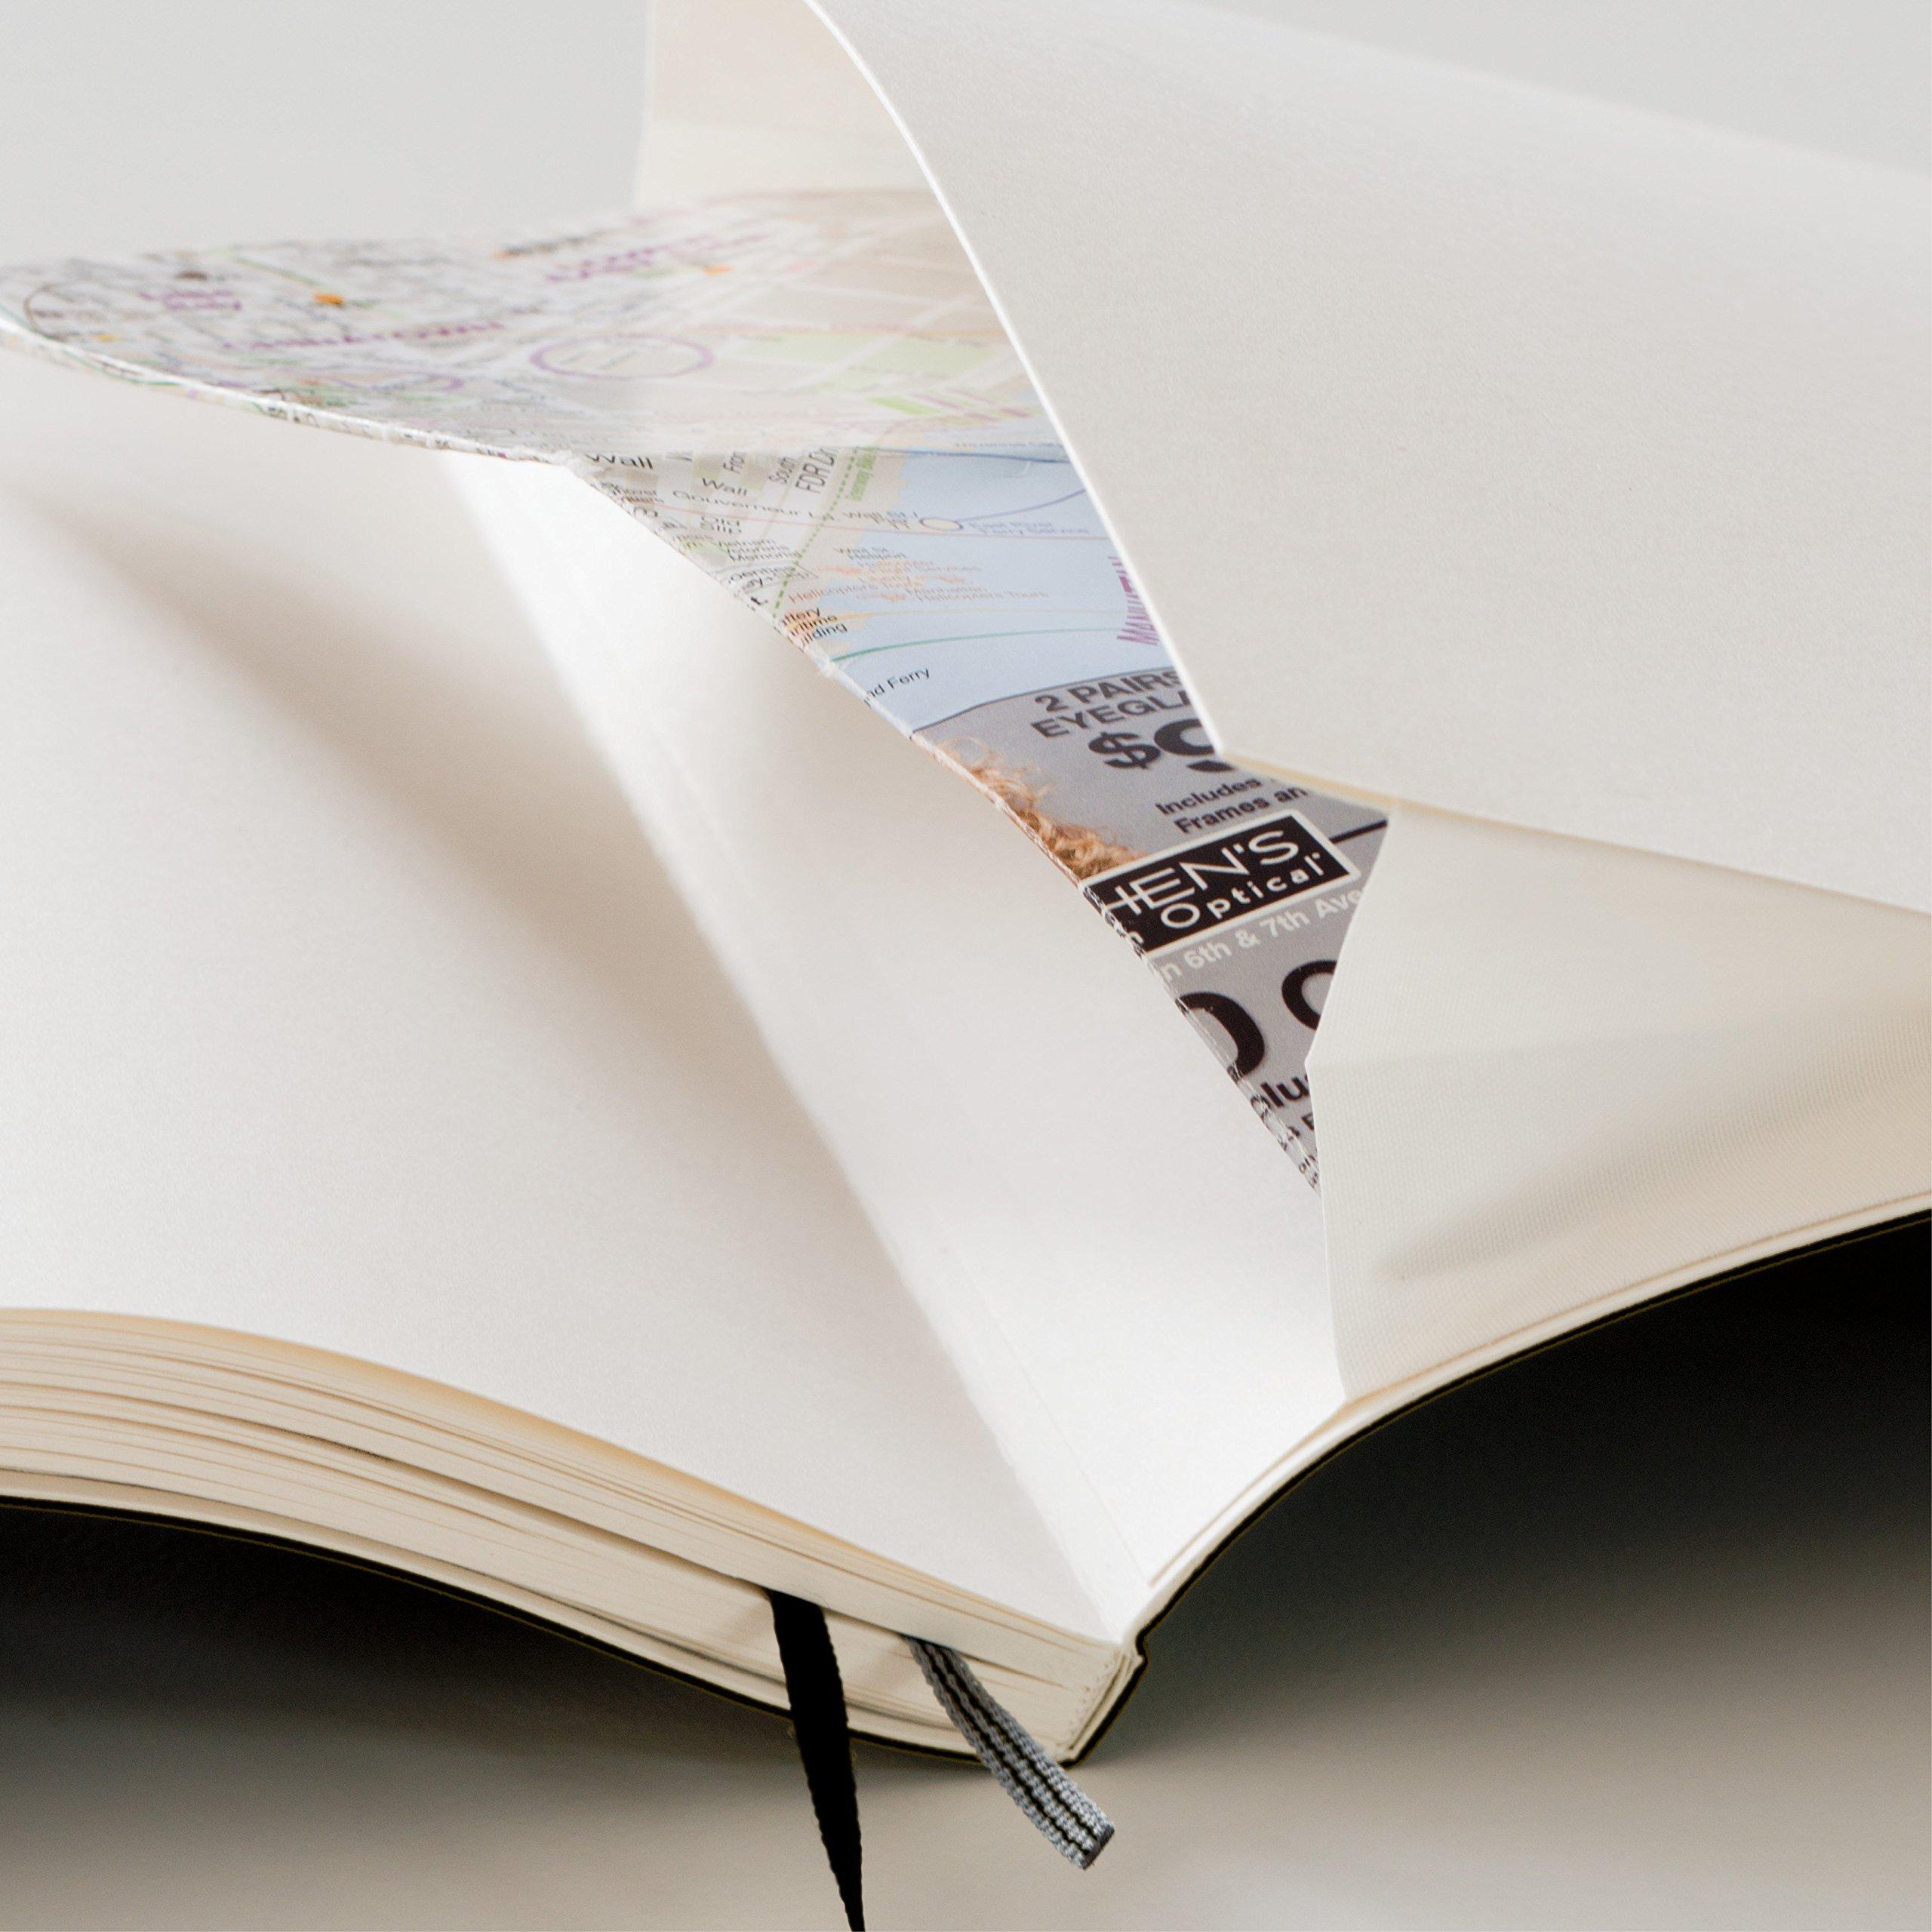 Leuchtturm1917 Medium Size B5 Softcover Notebook Plain Black by LEUCHTTURM1917 (Image #3)